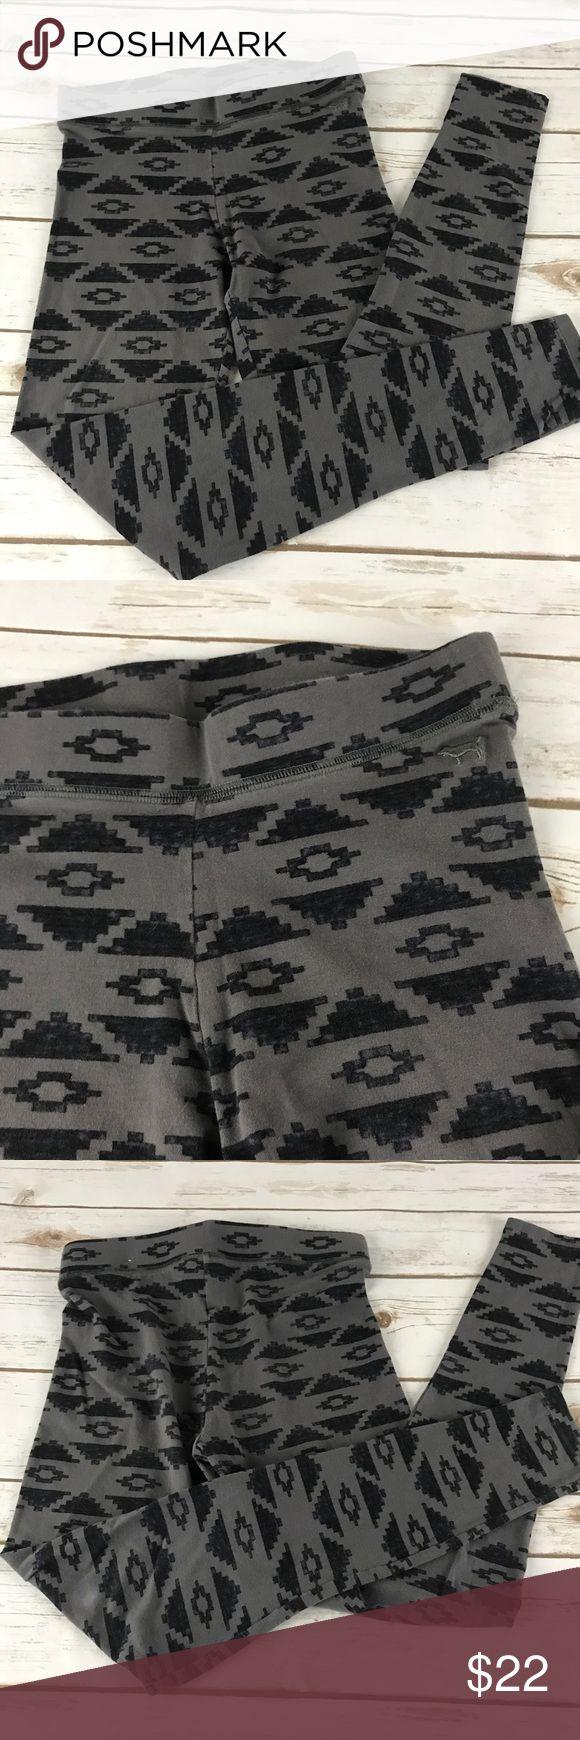 "PINK Victoria's Secret Aztec Print Leggings These Aztec print leggings are in great condition.  📐Measurements & Information 📐  Waist Approx 26"" Inseam approx 28"" Rise Approx 8.25"" PINK Victoria's Secret Pants Leggings"